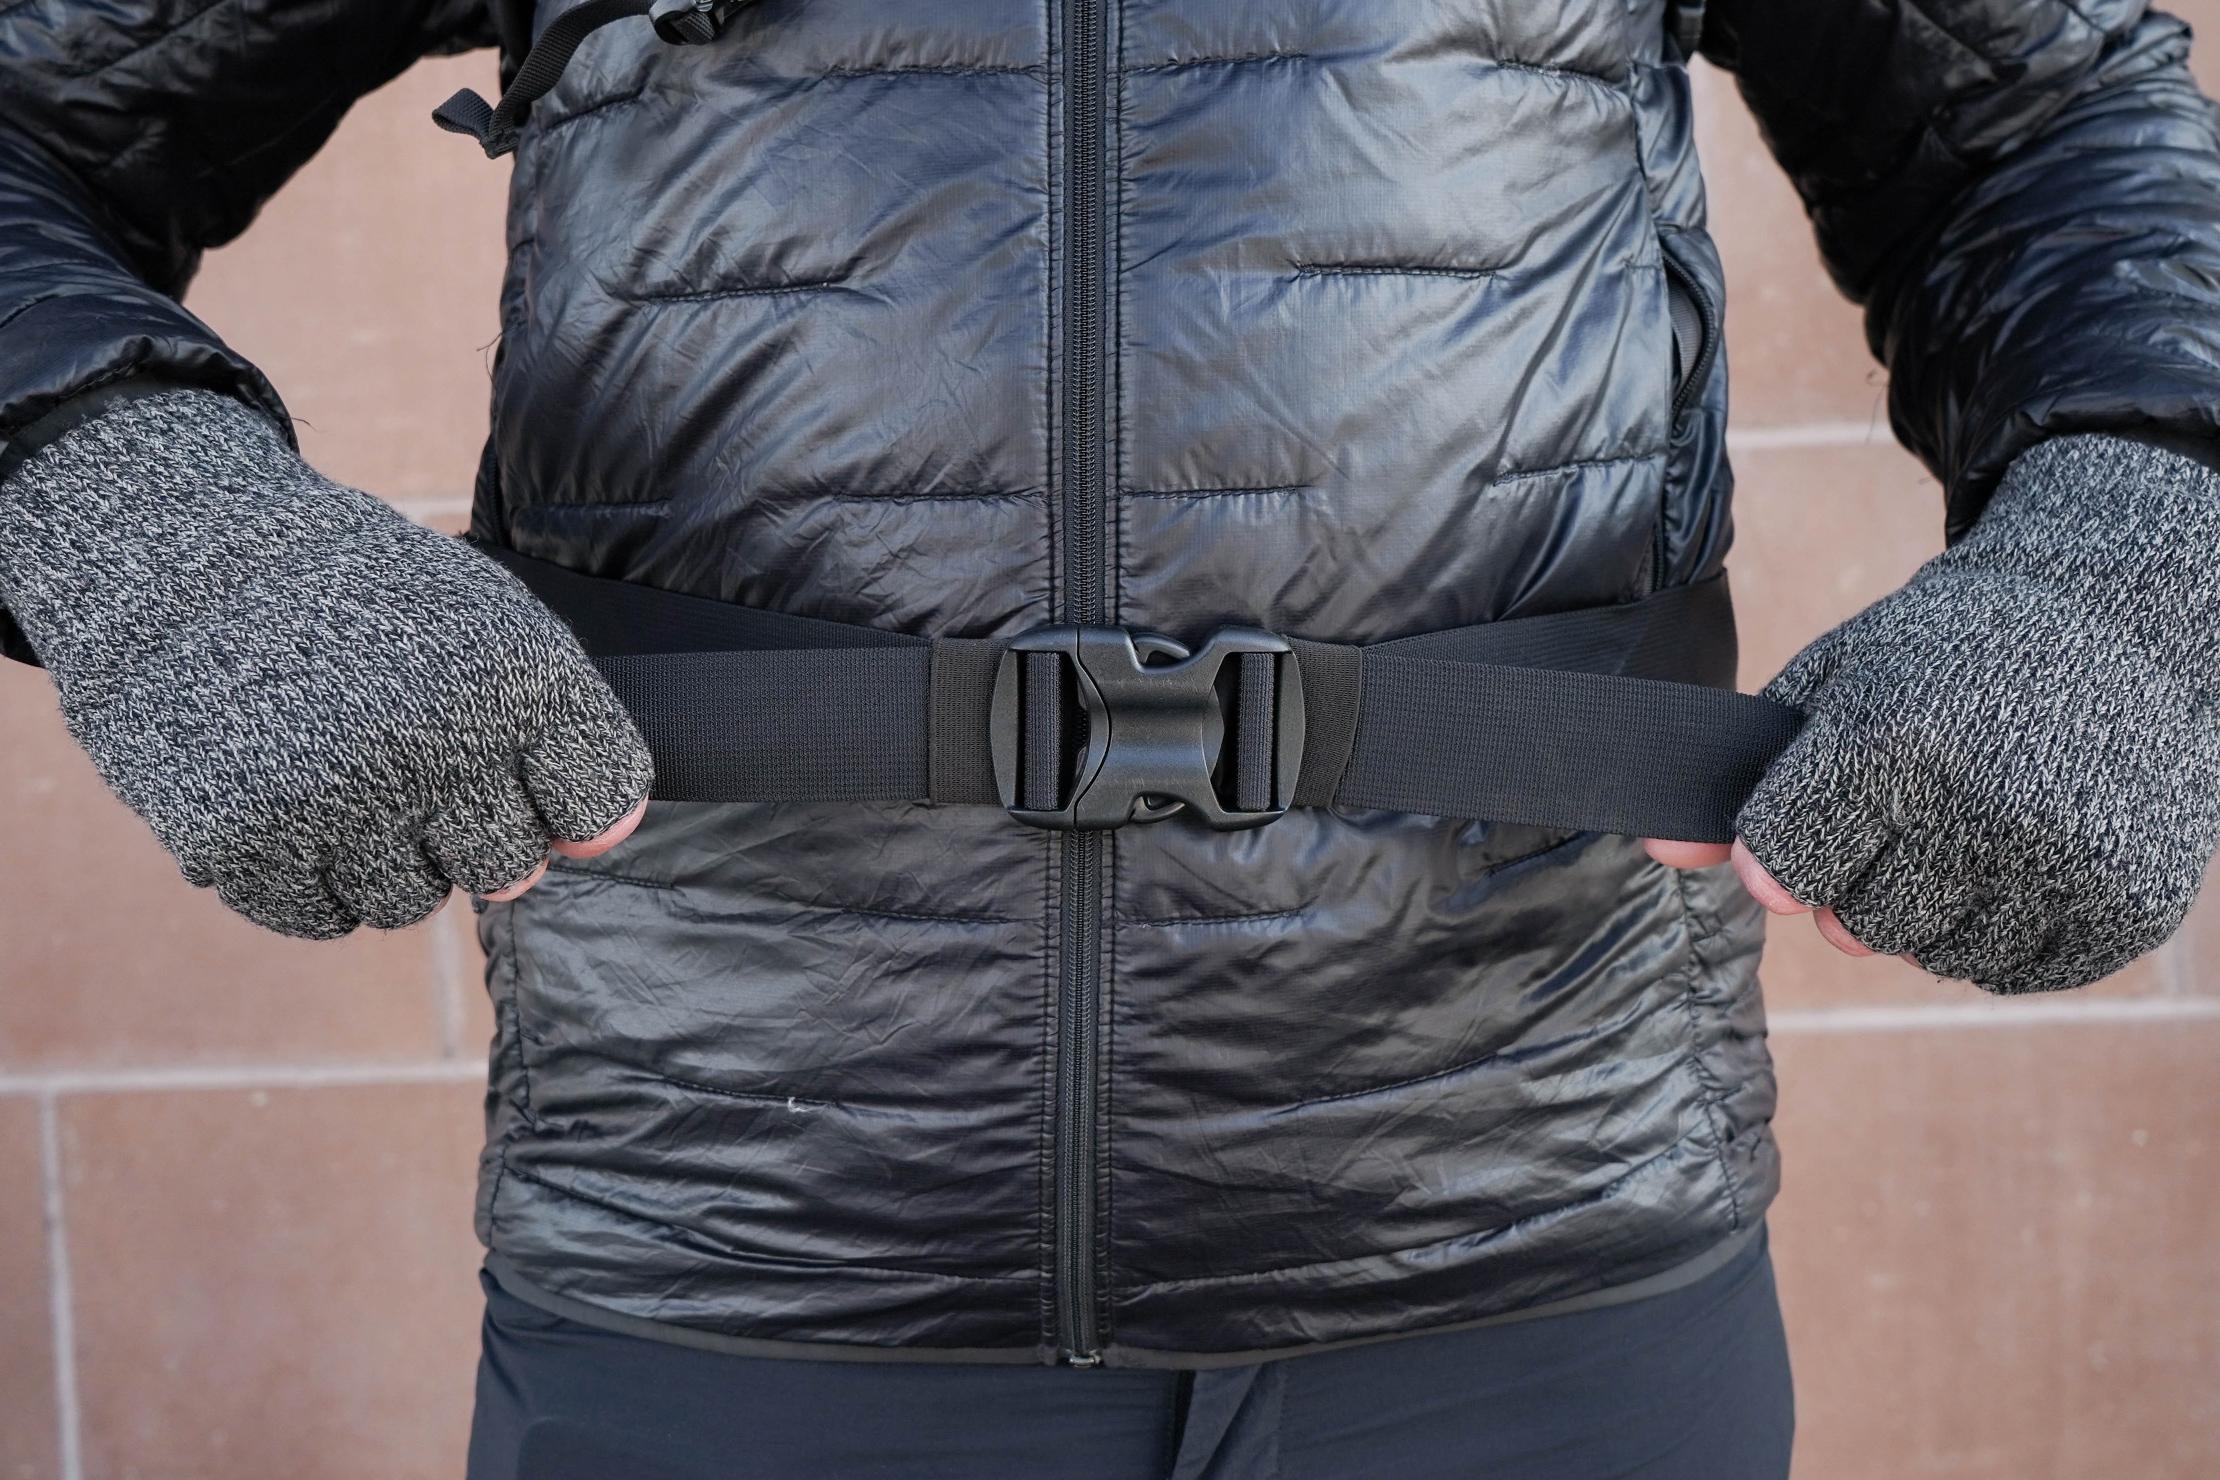 Cotopaxi Allpa 42L Hip Belt